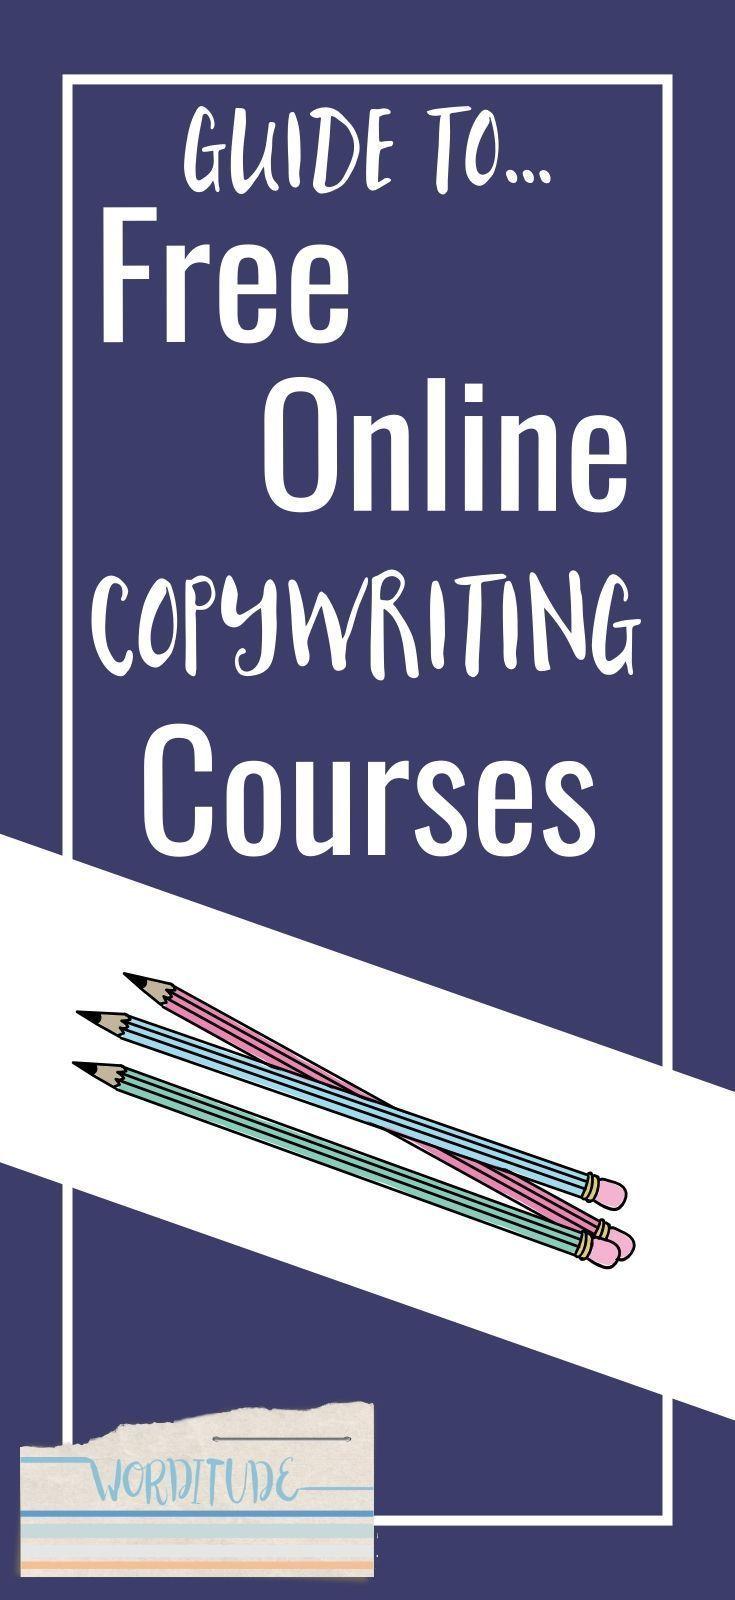 Free copywriting courses for freelance copywriters